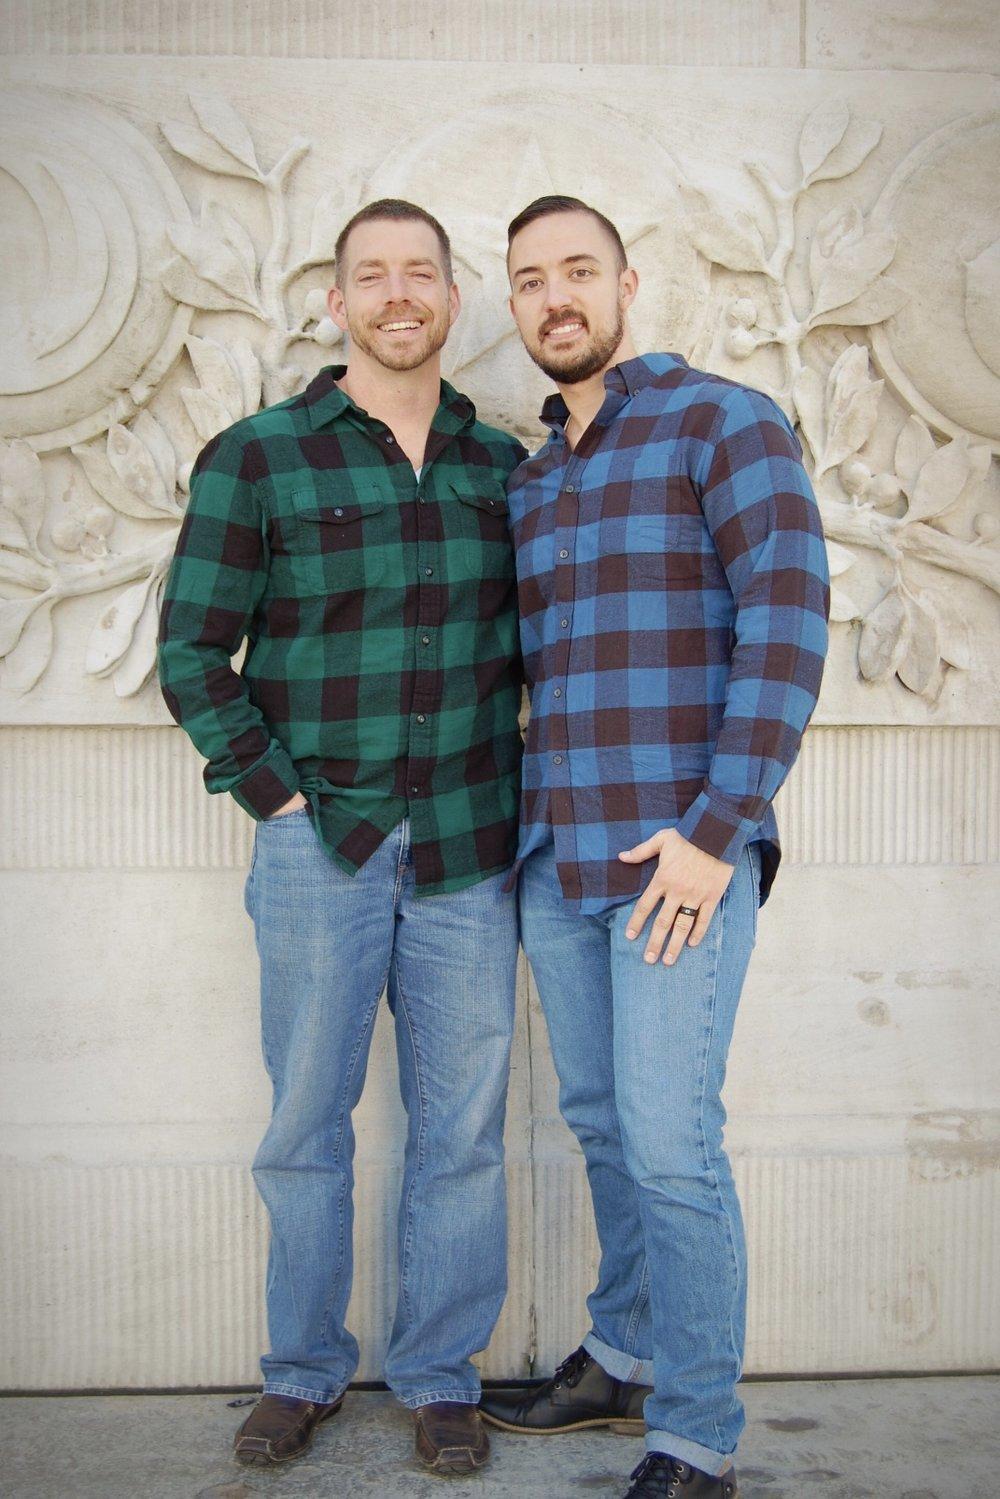 Jeremy & Dustin, photo by Photos by Melody Vinyard (IG: @melodysue8)